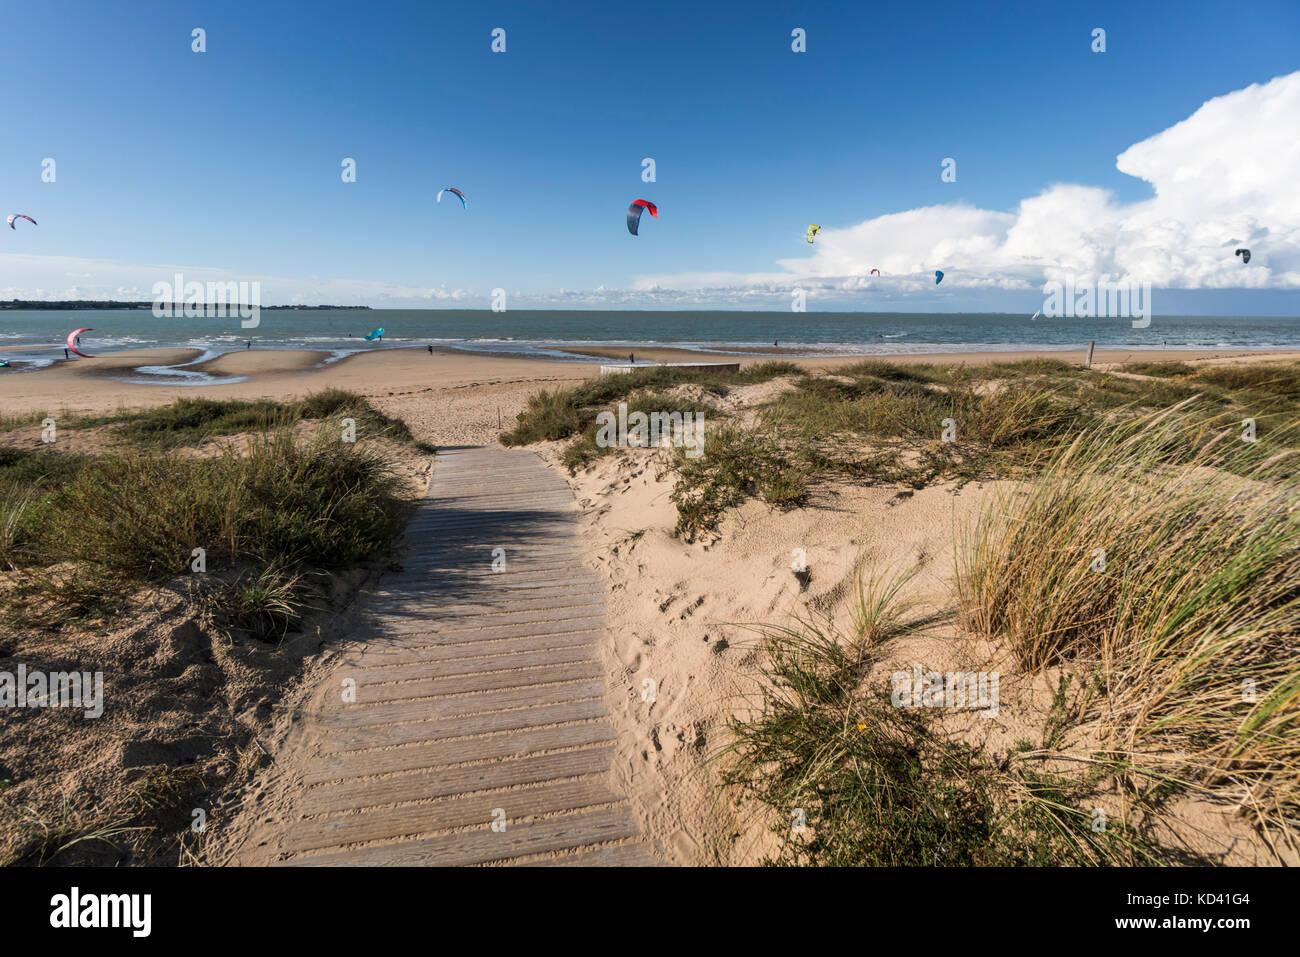 Kitesurfer, Plage Nord, Ile de Re, Nouvelle-Aquitaine, french westcoast, france, - Stock Image